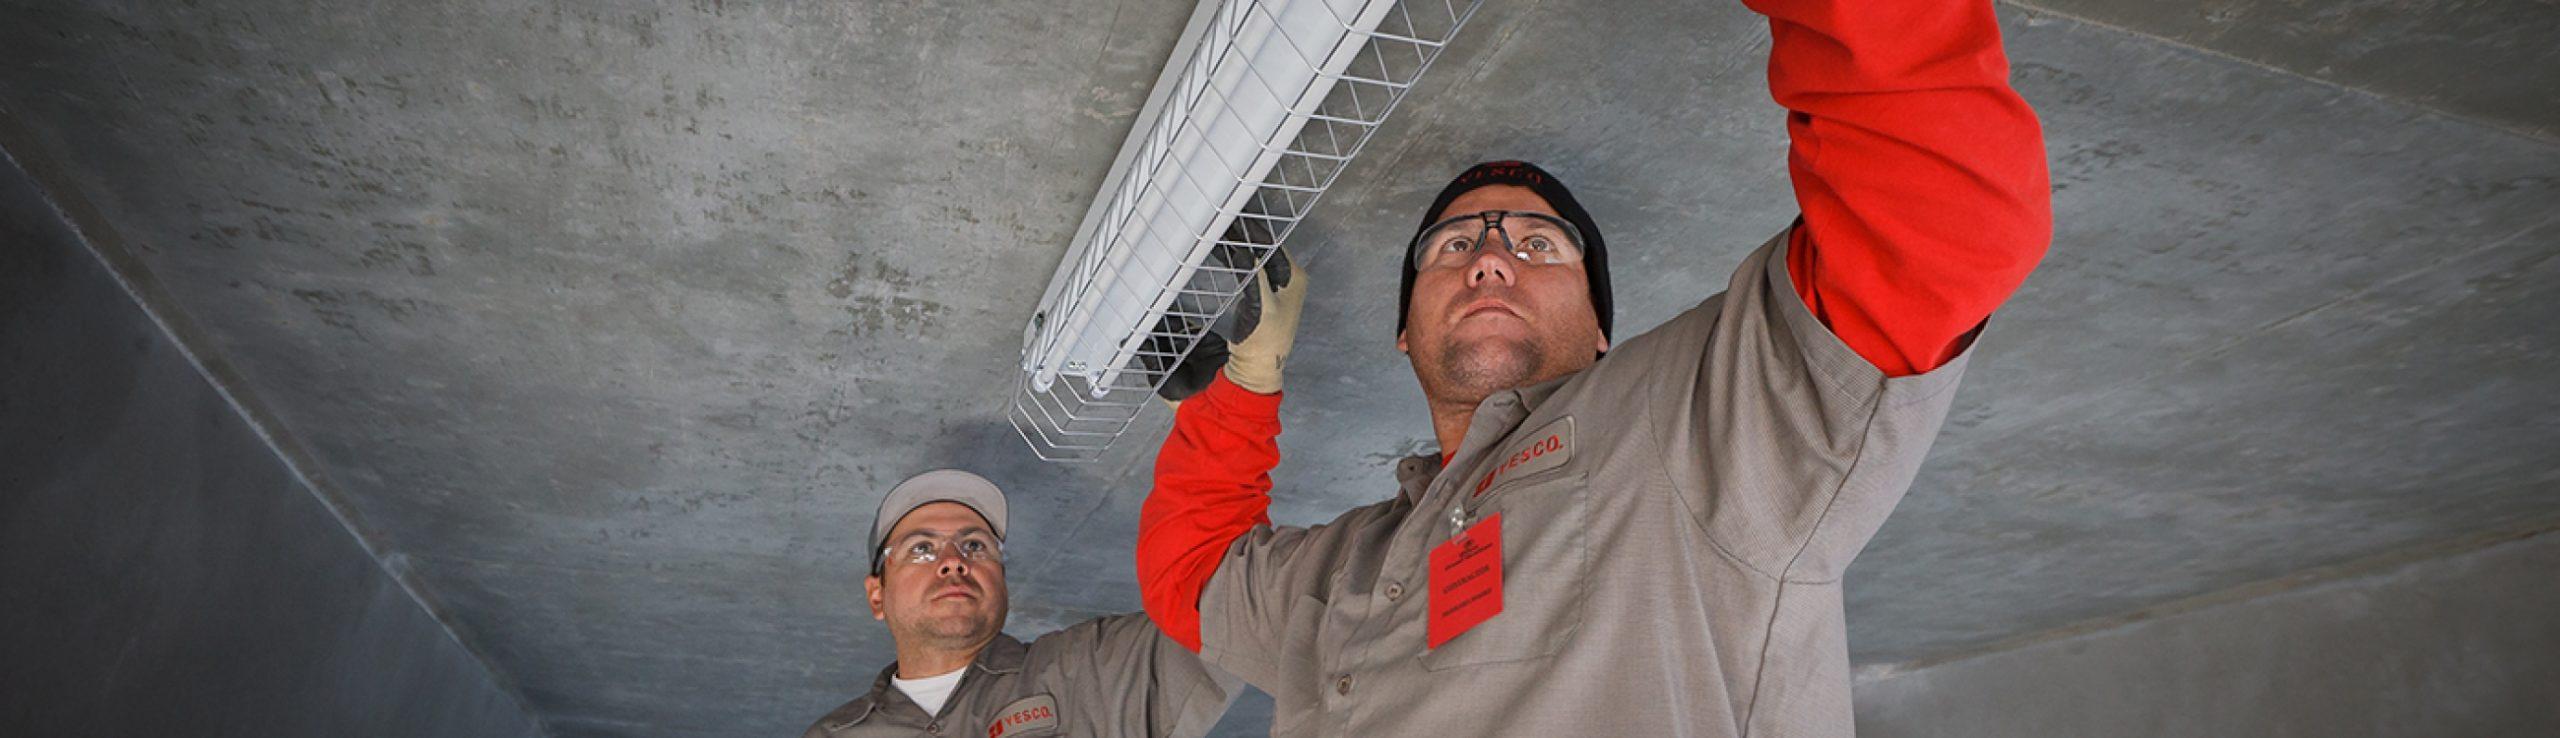 lighting maintenance